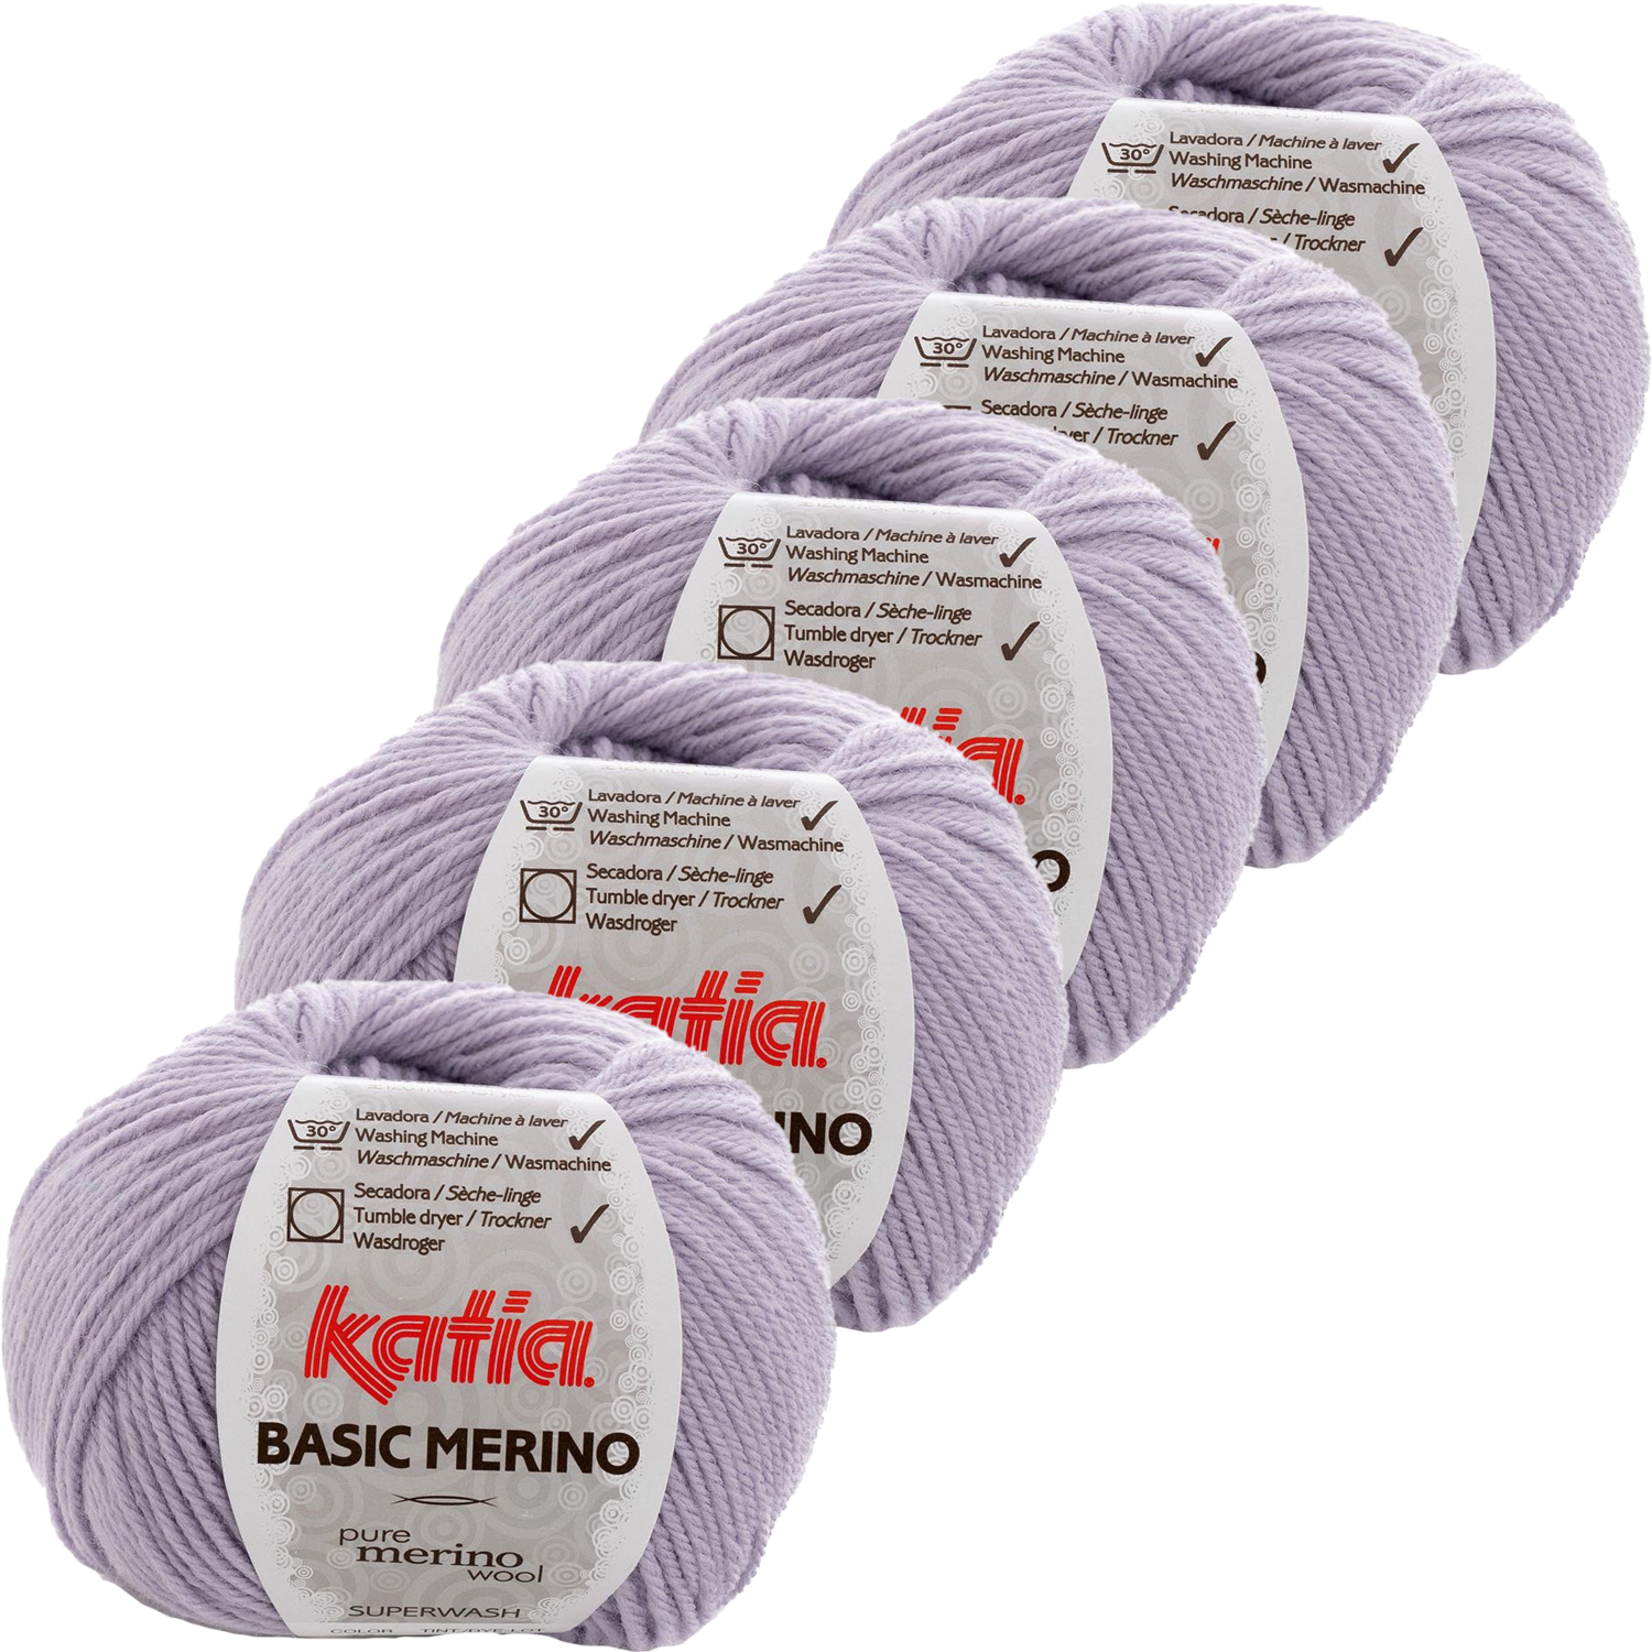 Katia Basic Merino - kleur 77_Licht lila - bundel 5 bollen 50 gr.  van 120 m.